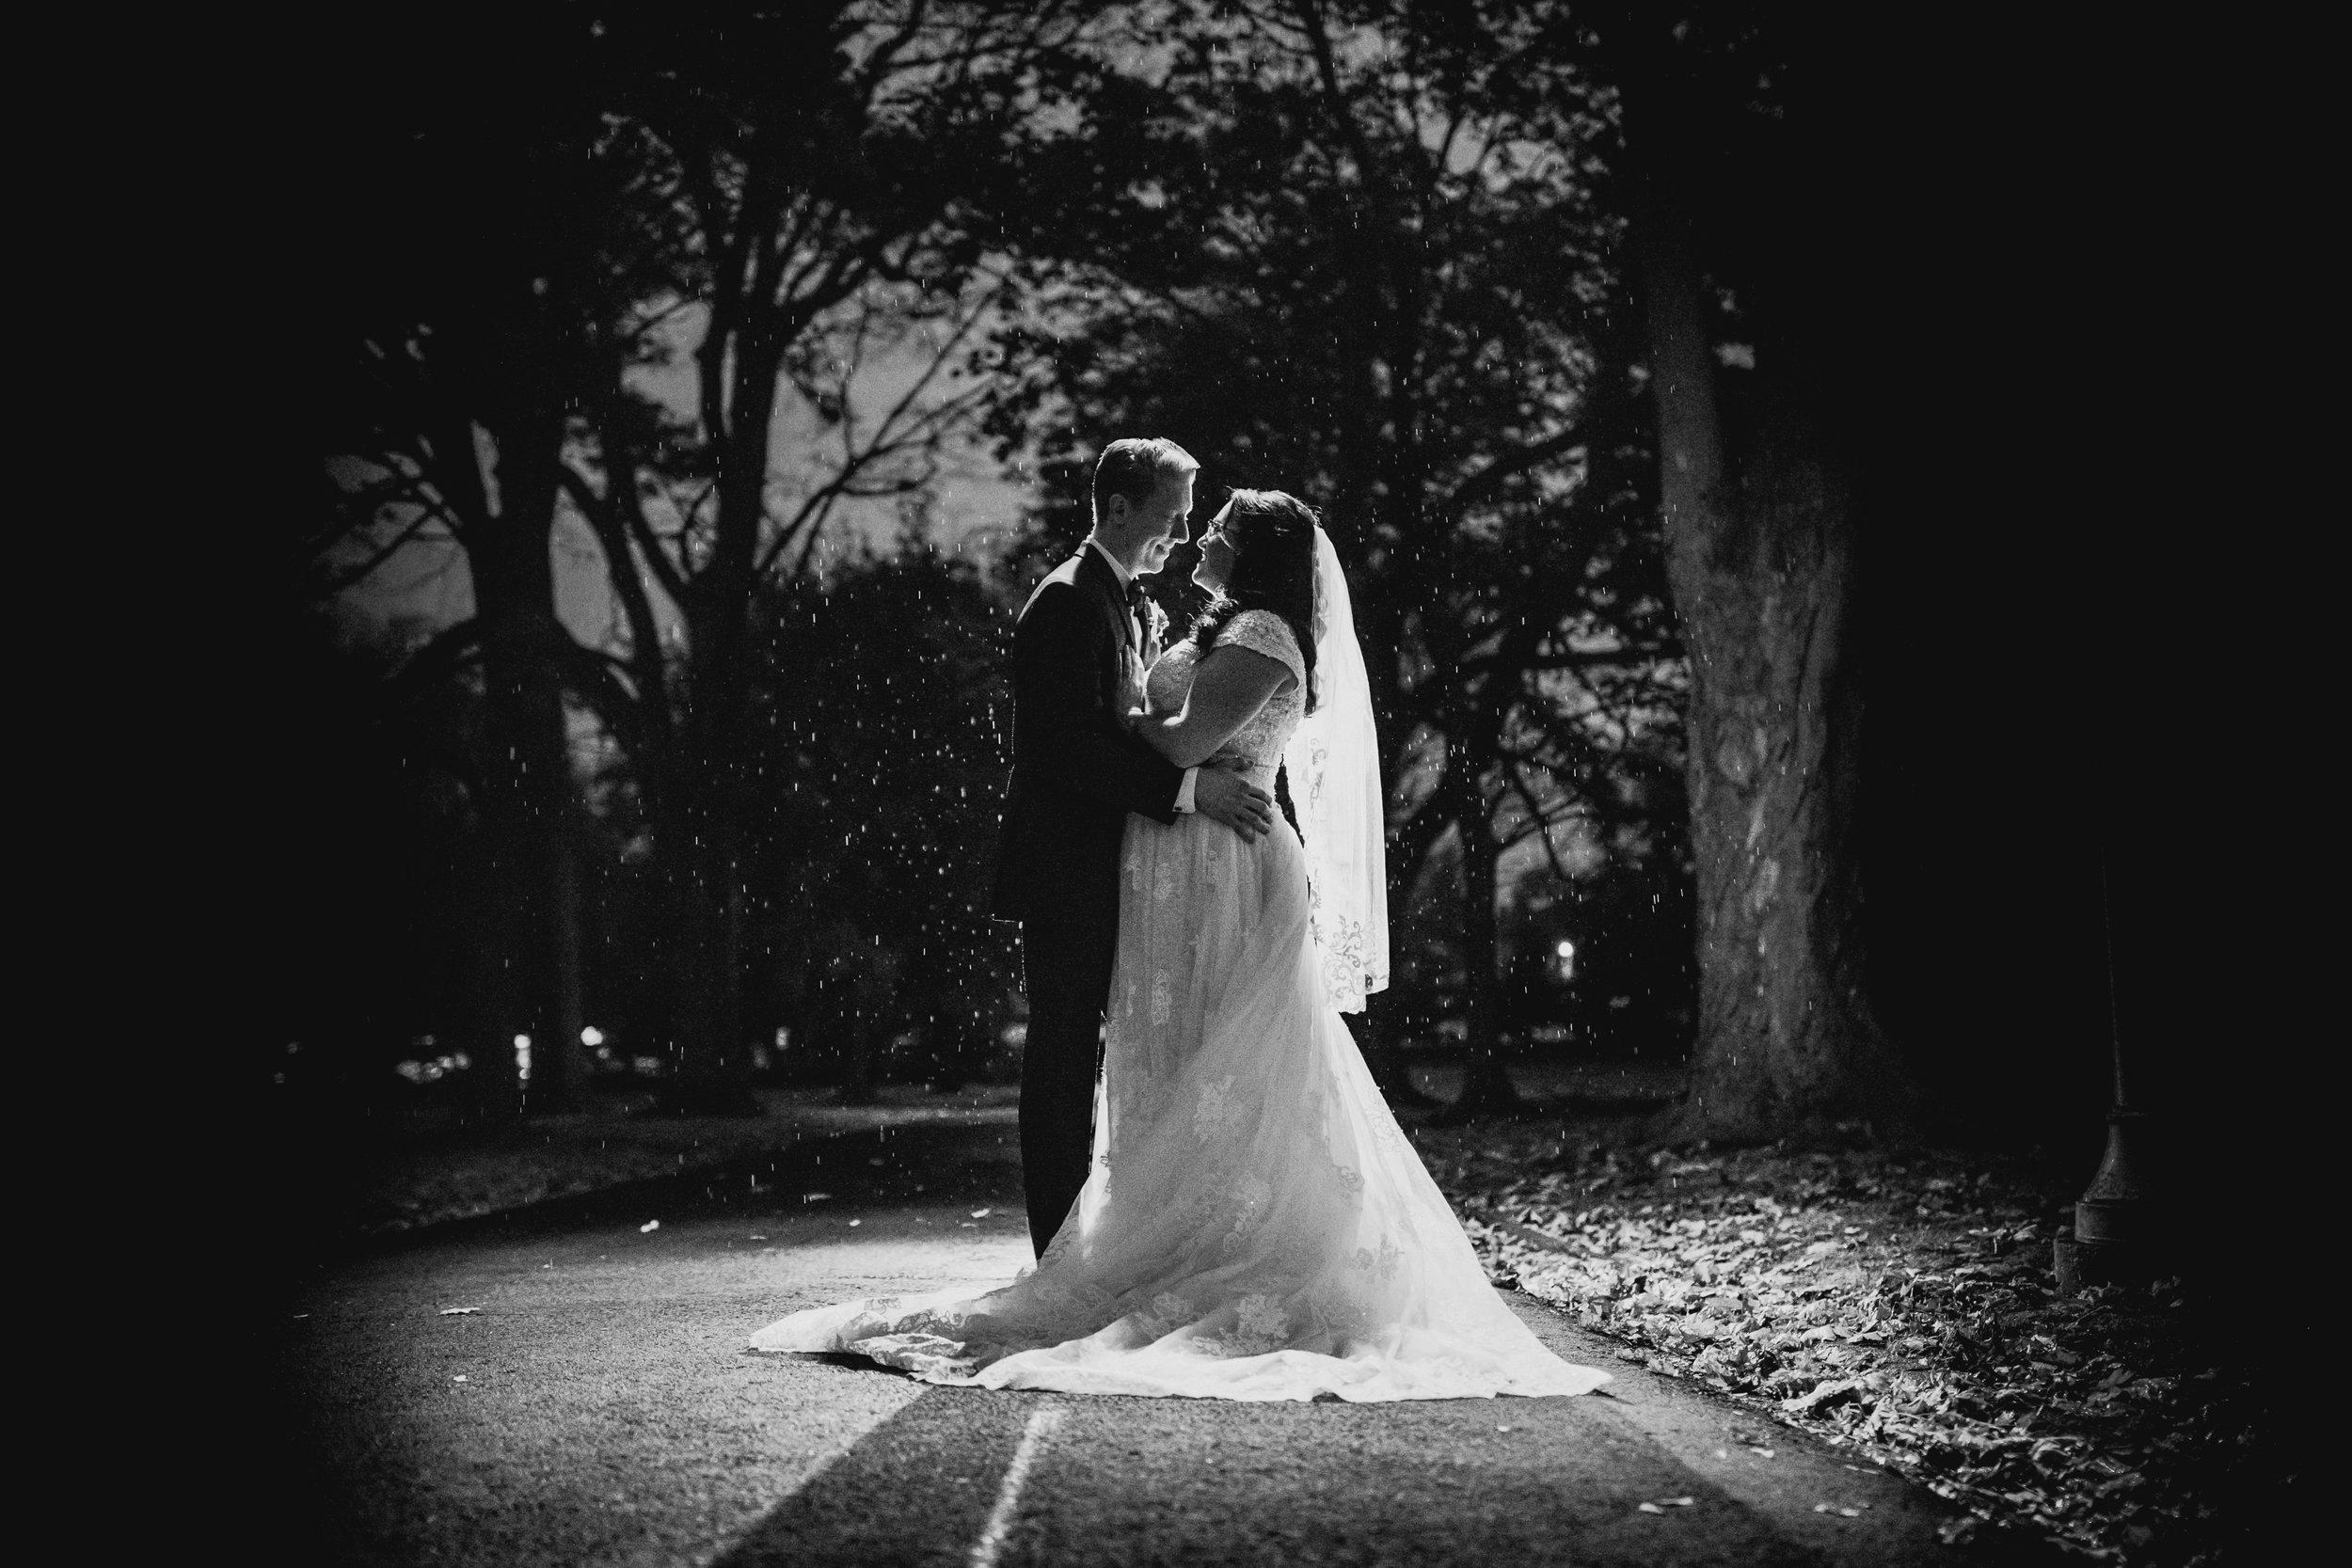 New-Jersey-Wedding-Photography-Fishers-Tudor-House-JennaLynnPhotography-Bride&GroomBW-Kathleen&Eddie-17.jpg